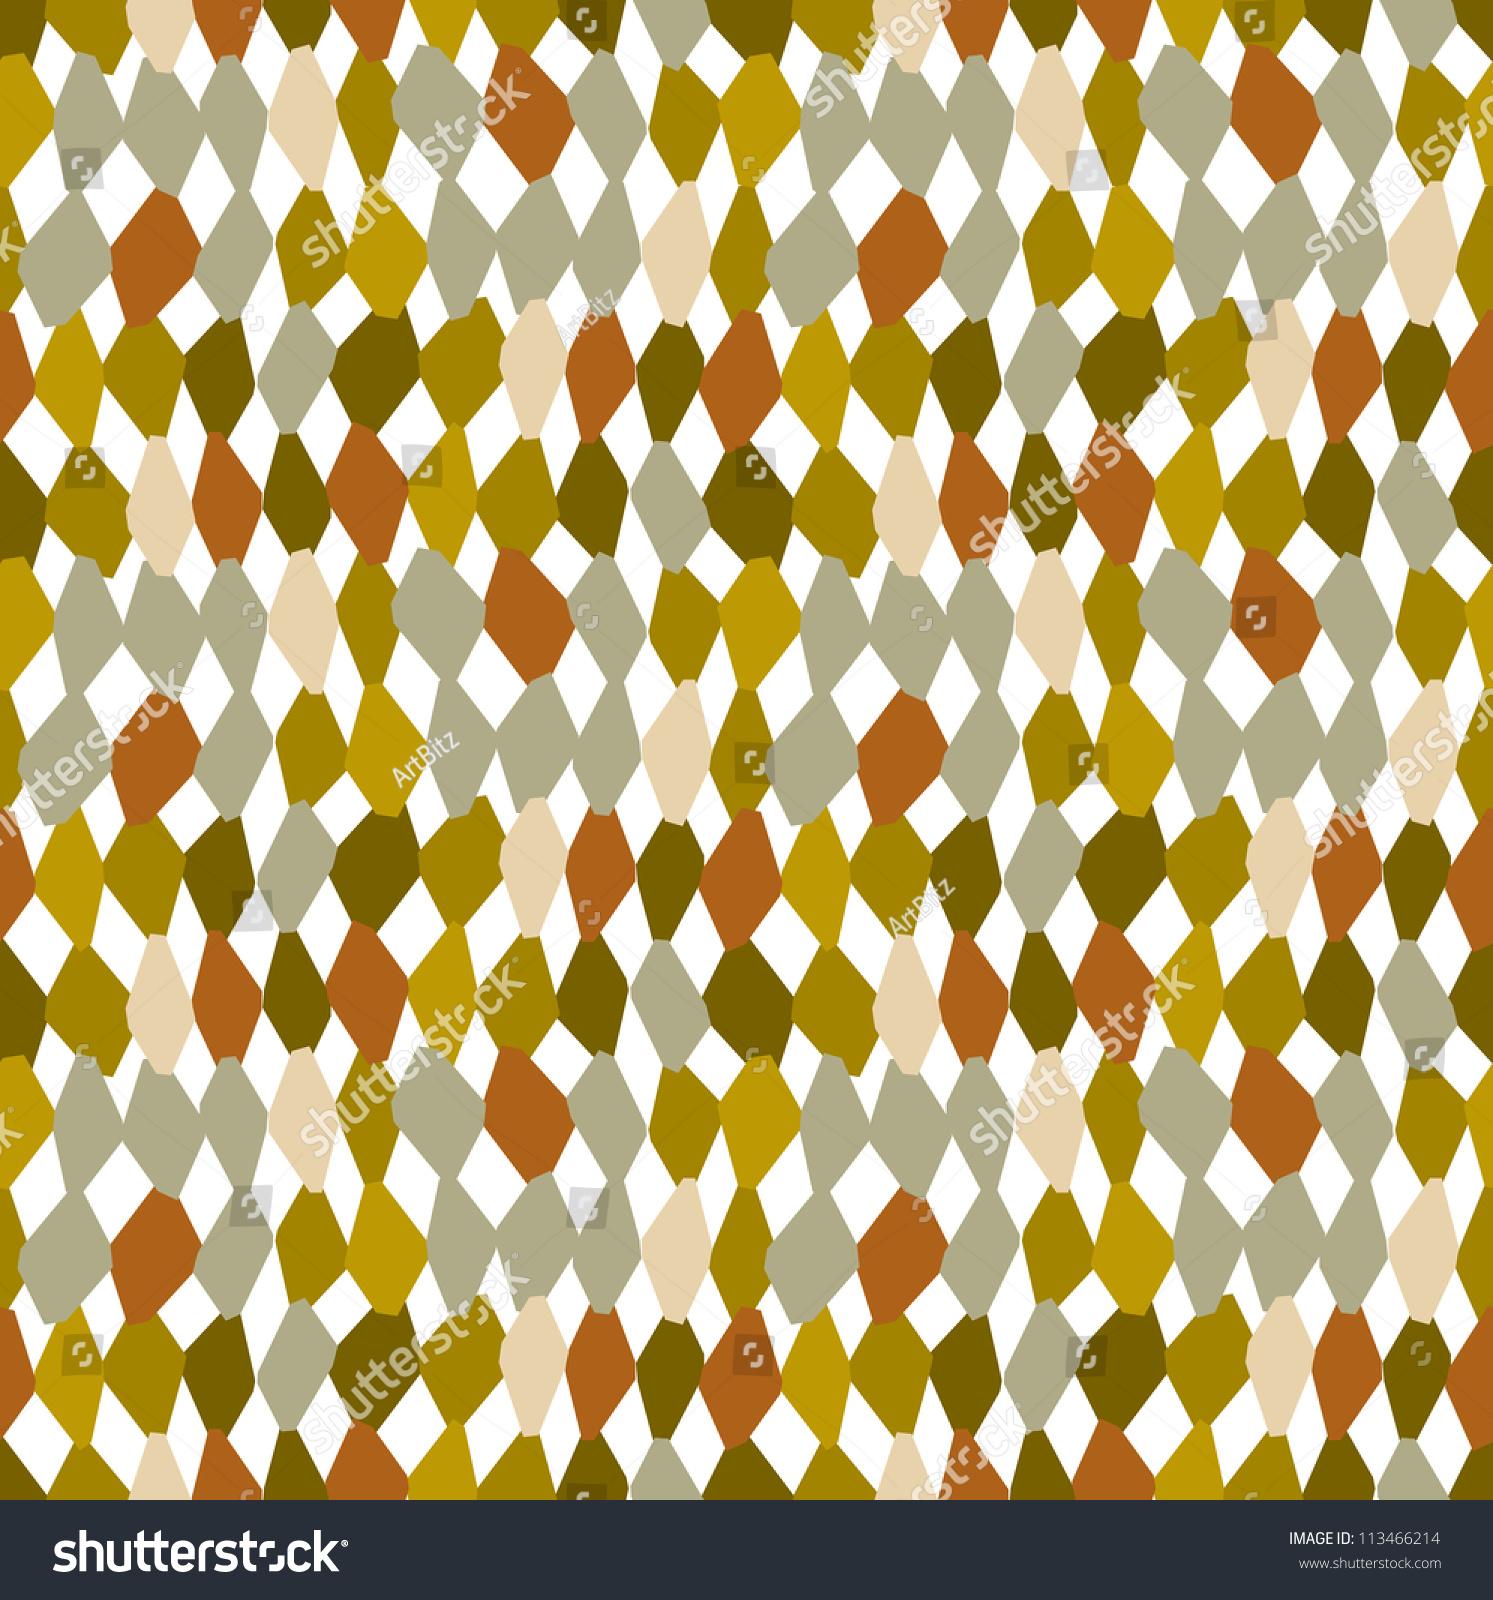 Vector Hand Drawn Abstract Organic Woven Texture